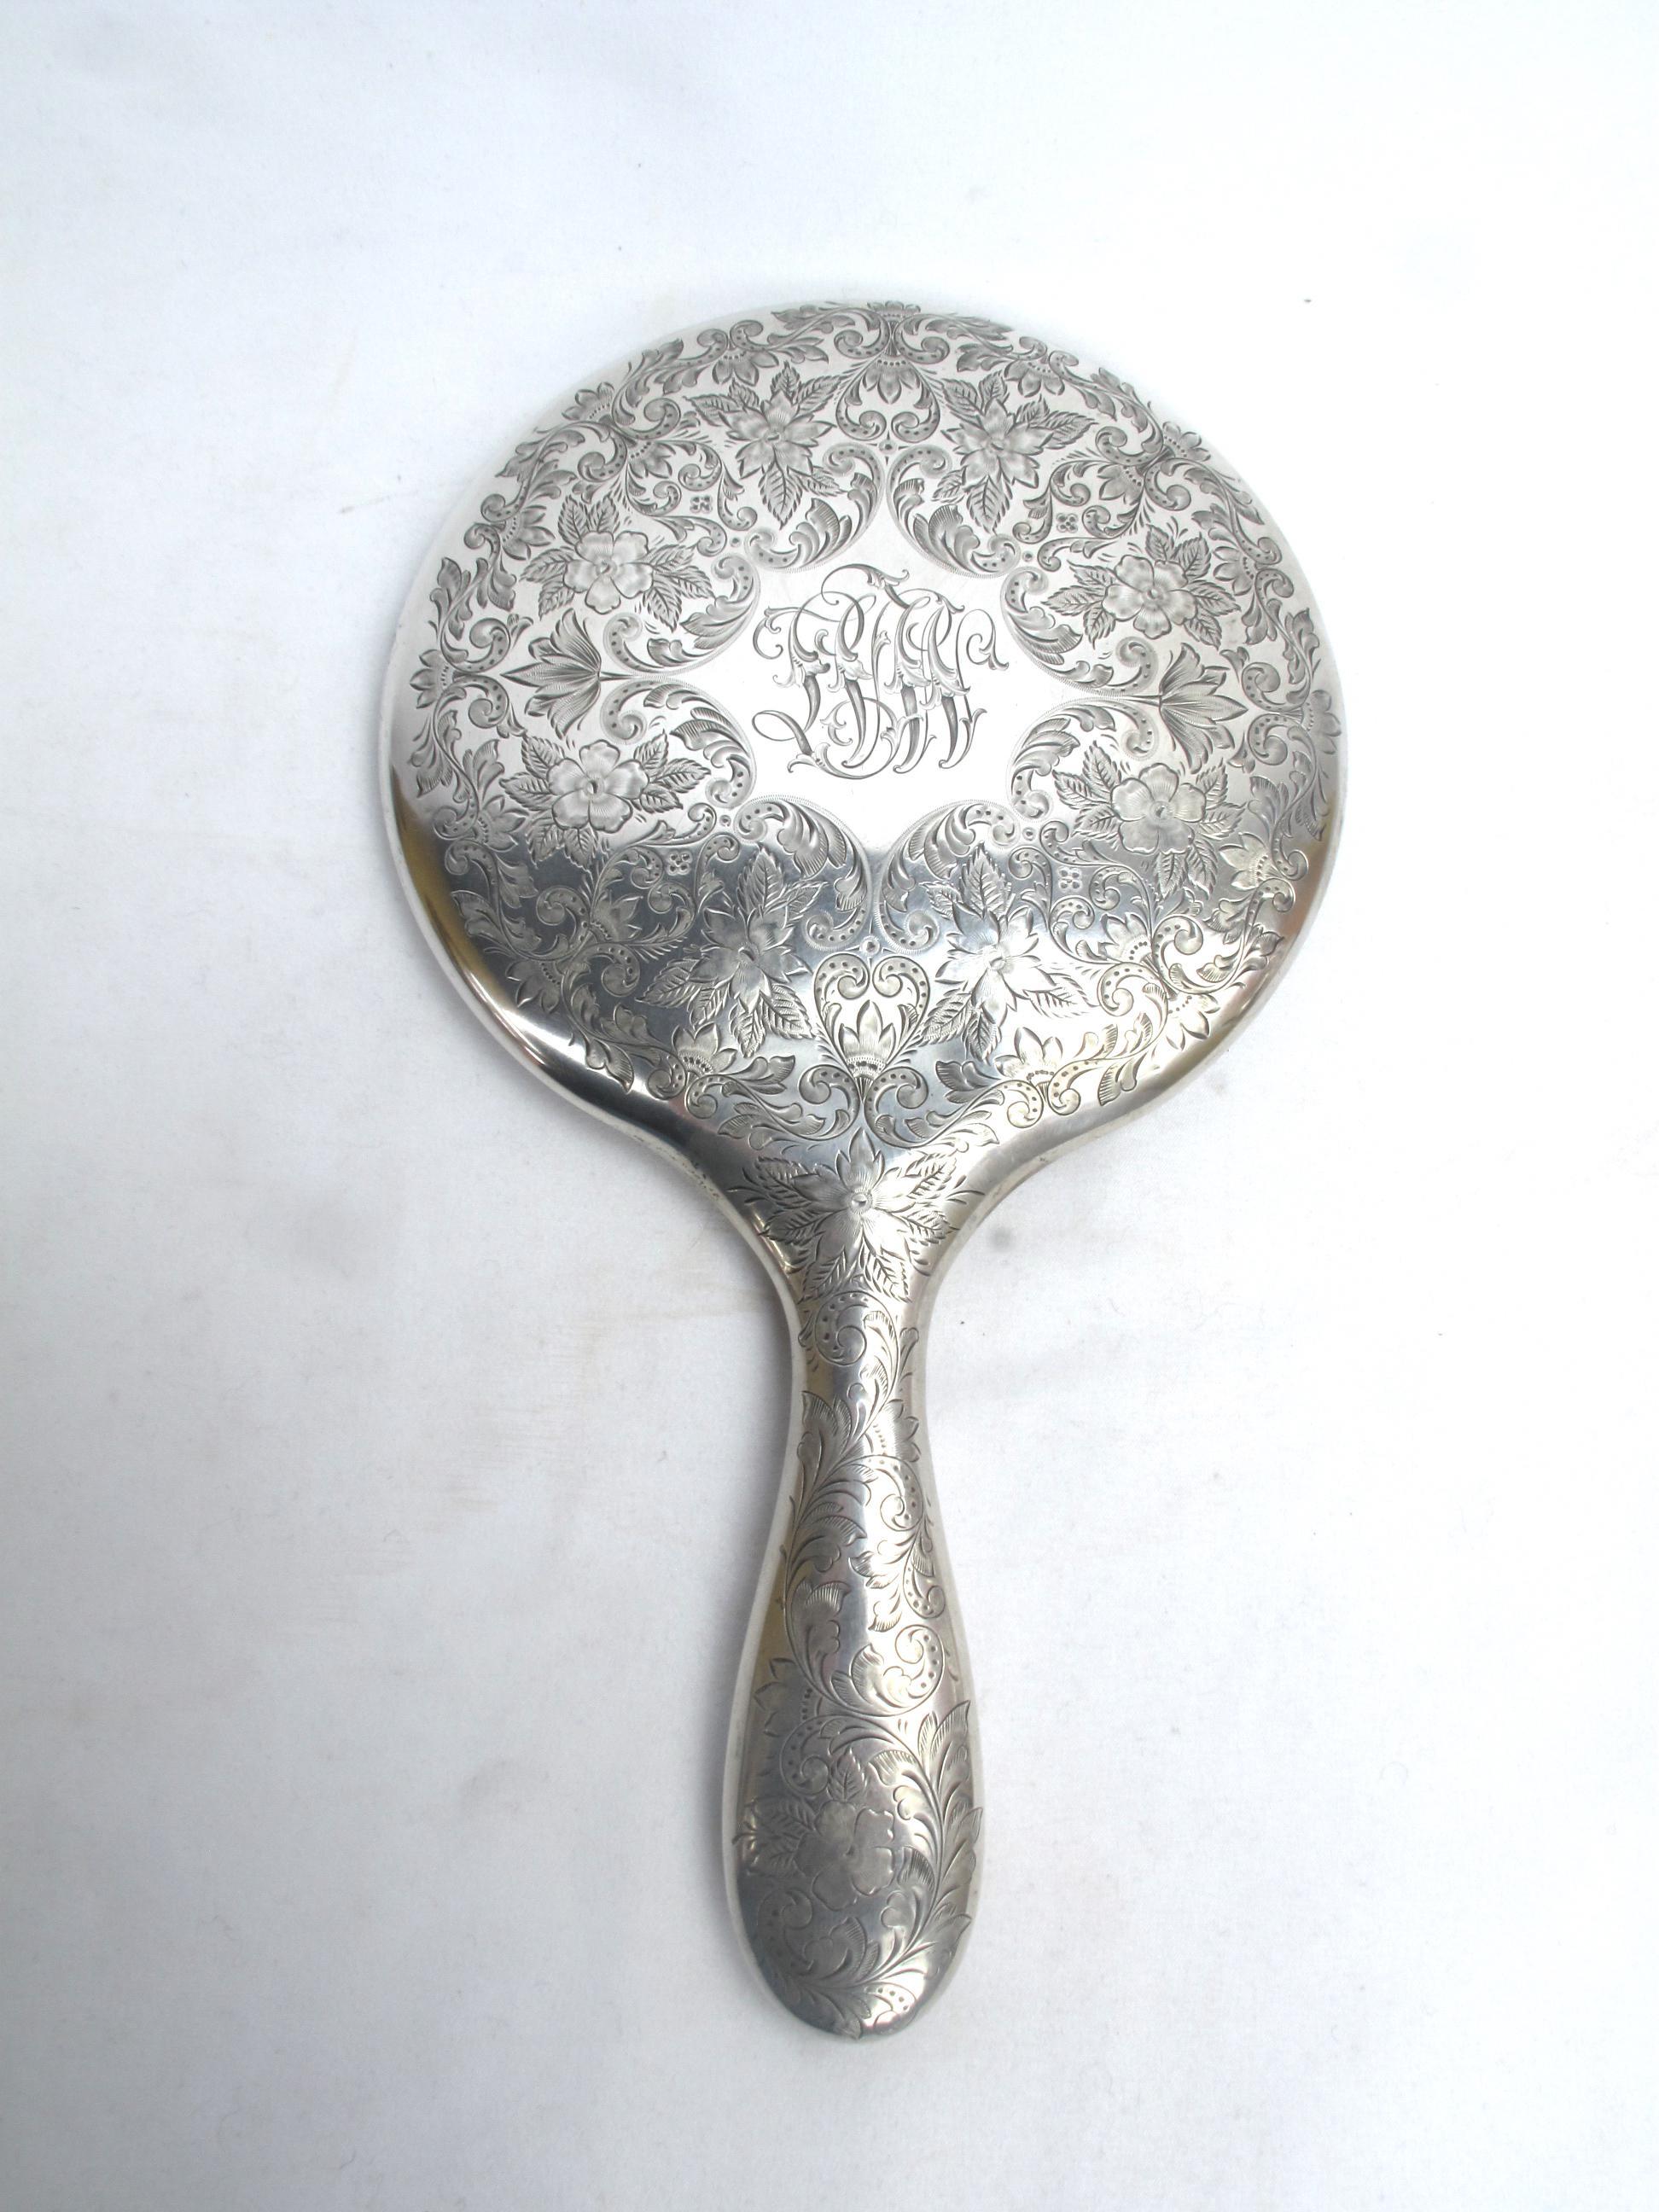 Antique hand mirror Drawing Silver Antique Sterling Silver Hand Mirror With Floral Engraving Beveled Edge For Sale Image Amazoncom Antique Sterling Silver Hand Mirror With Floral Engraving Beveled